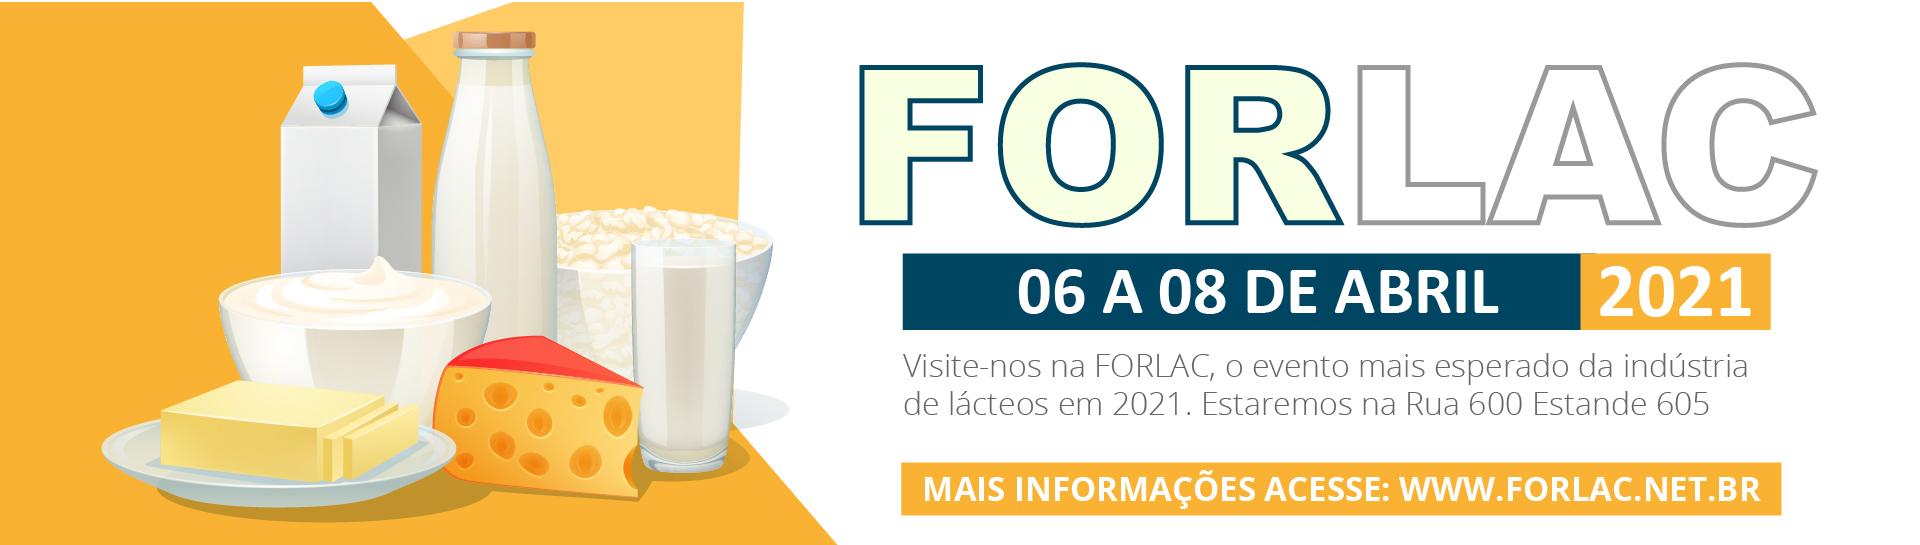 Forlac